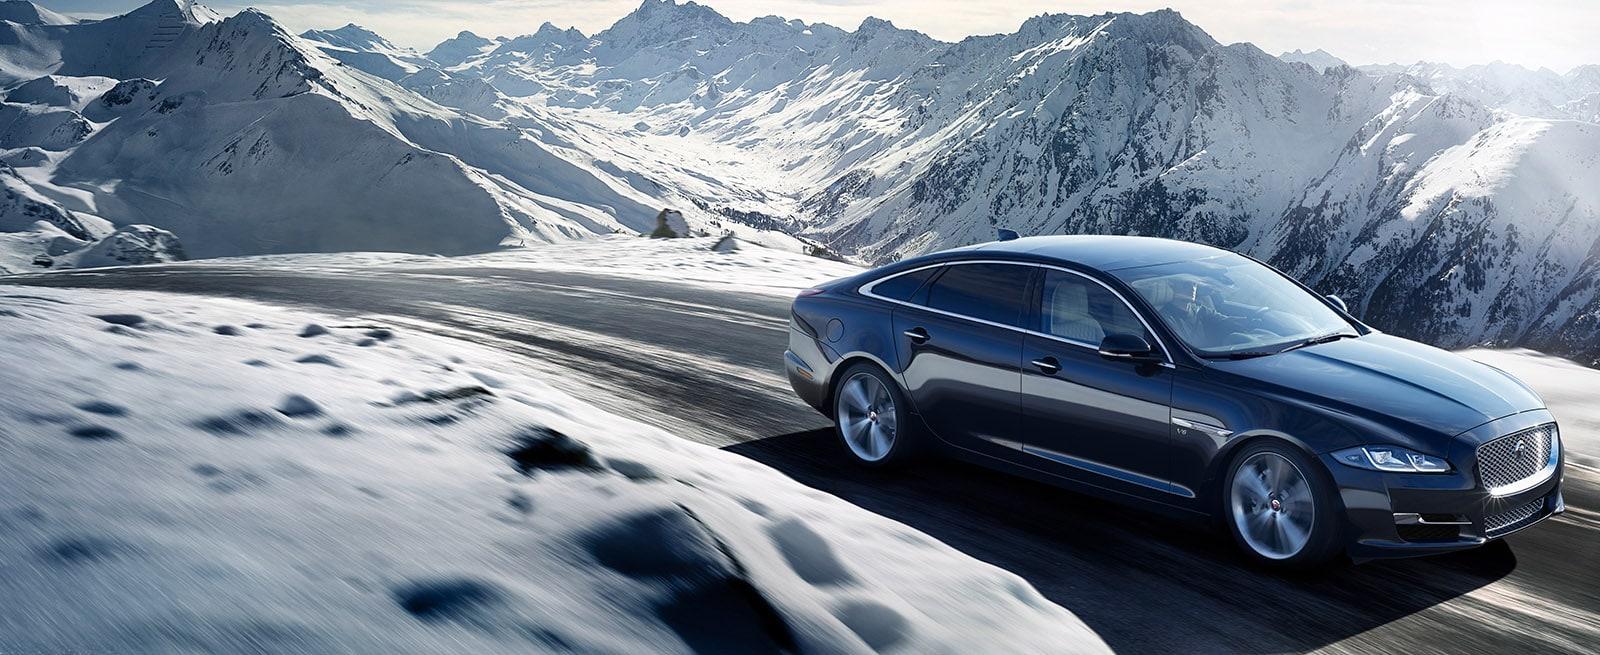 A Black Jaguar XJ Driving Through a Mountain pass